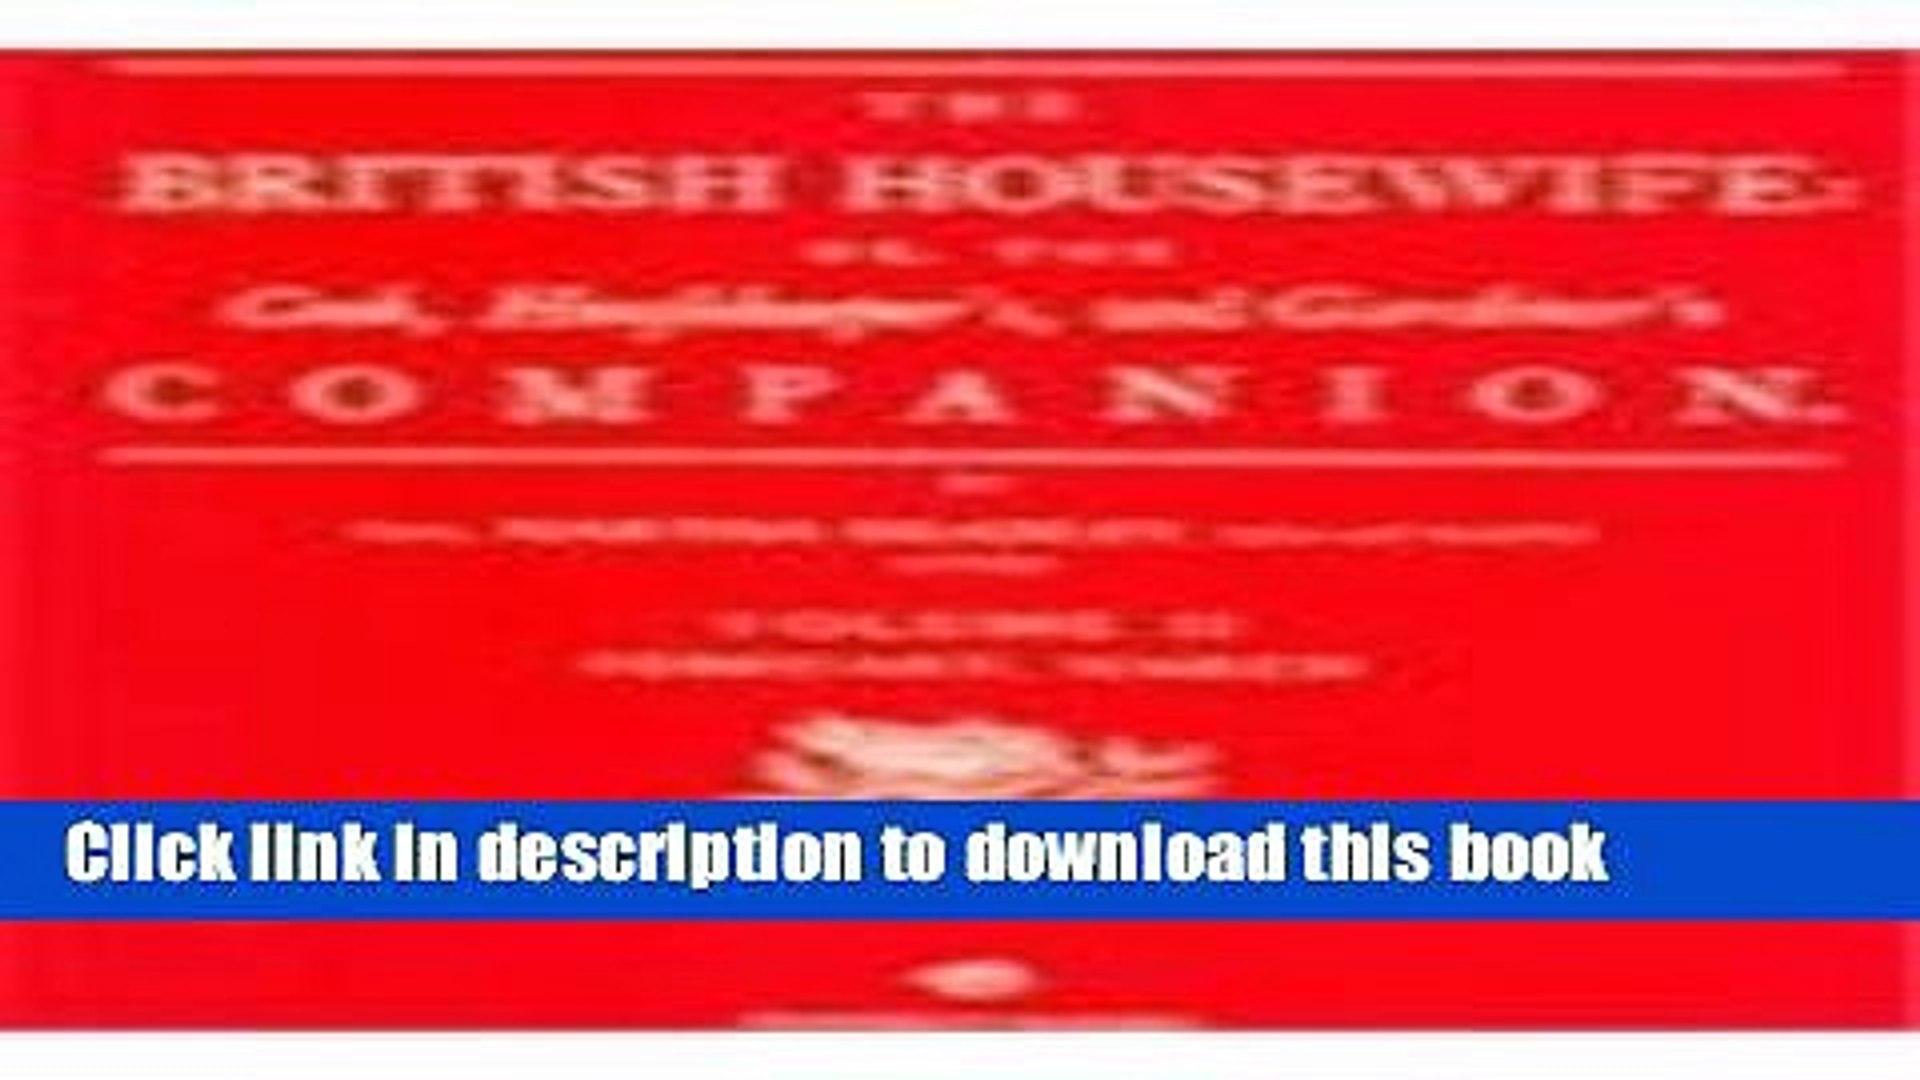 Books The British Housewife, Volume II Full Download